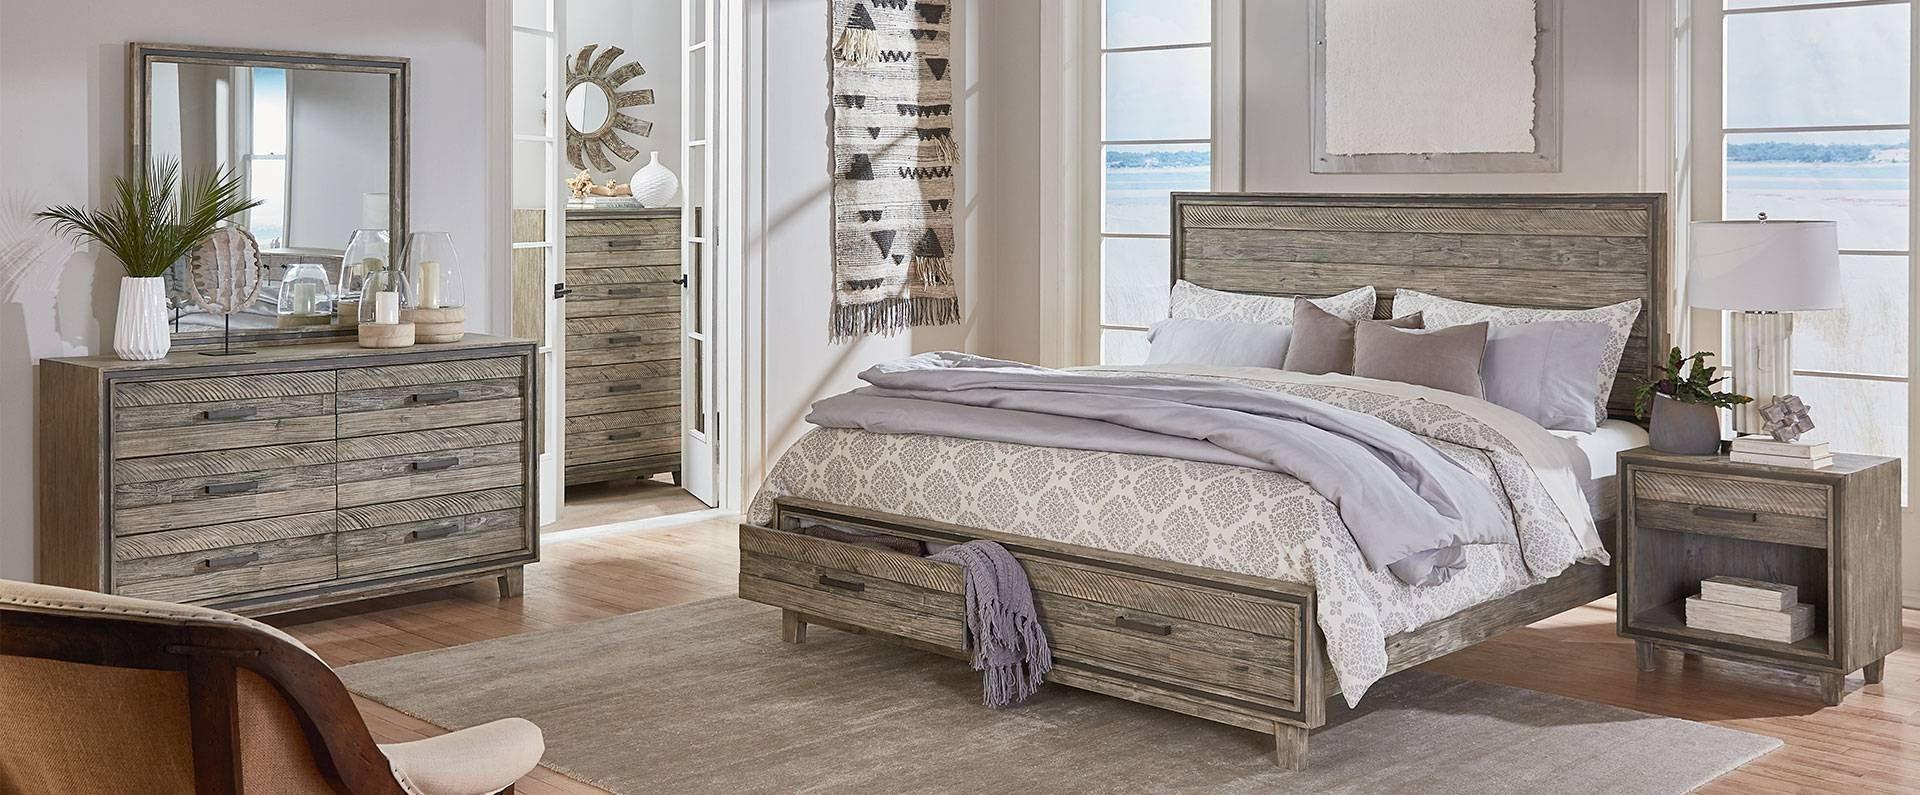 Rooms to Go King Bedroom Set Luxury Home Trends & Design